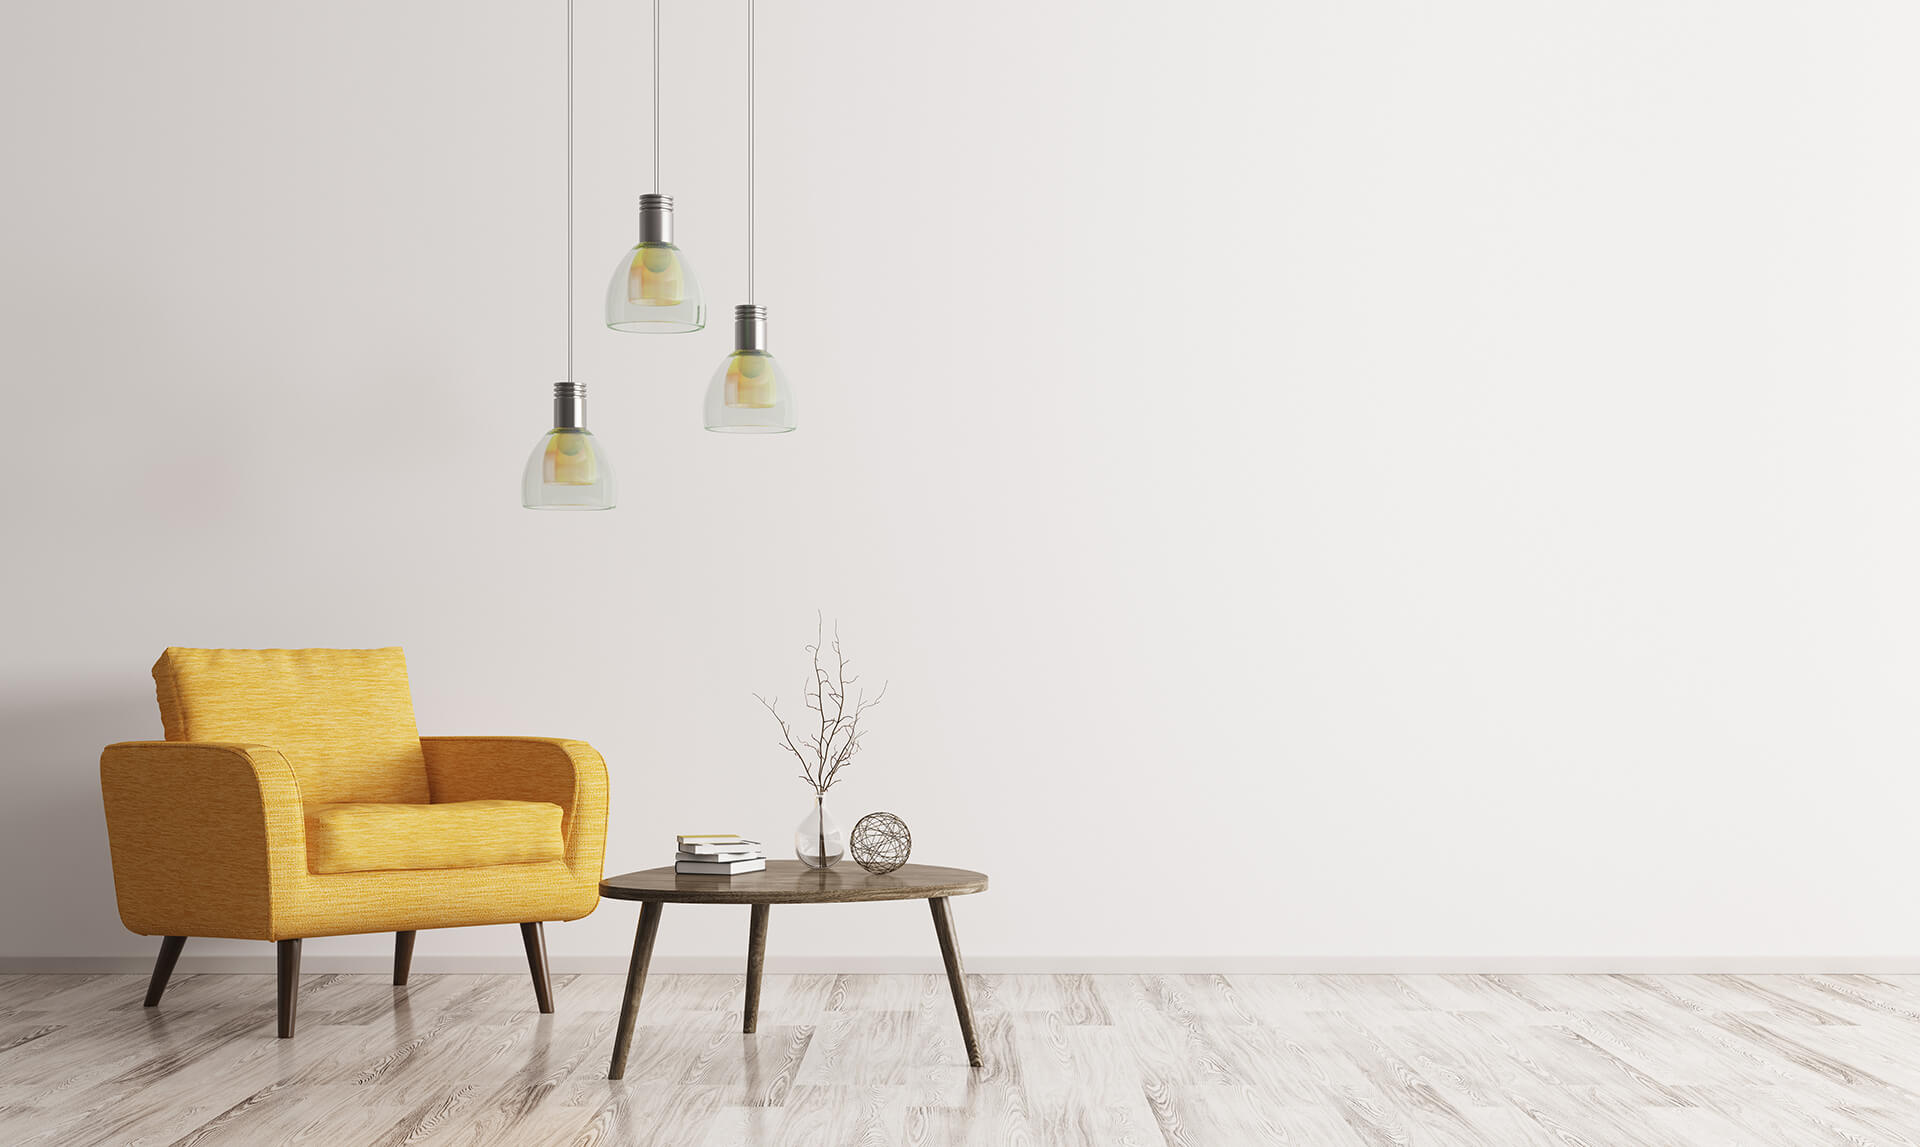 Decorative Fixtures, Decorative Hardware, Lighting, Lighting Fixtures, Design Lighting Group LLC, Design Lighting Group, Atlanta, GA